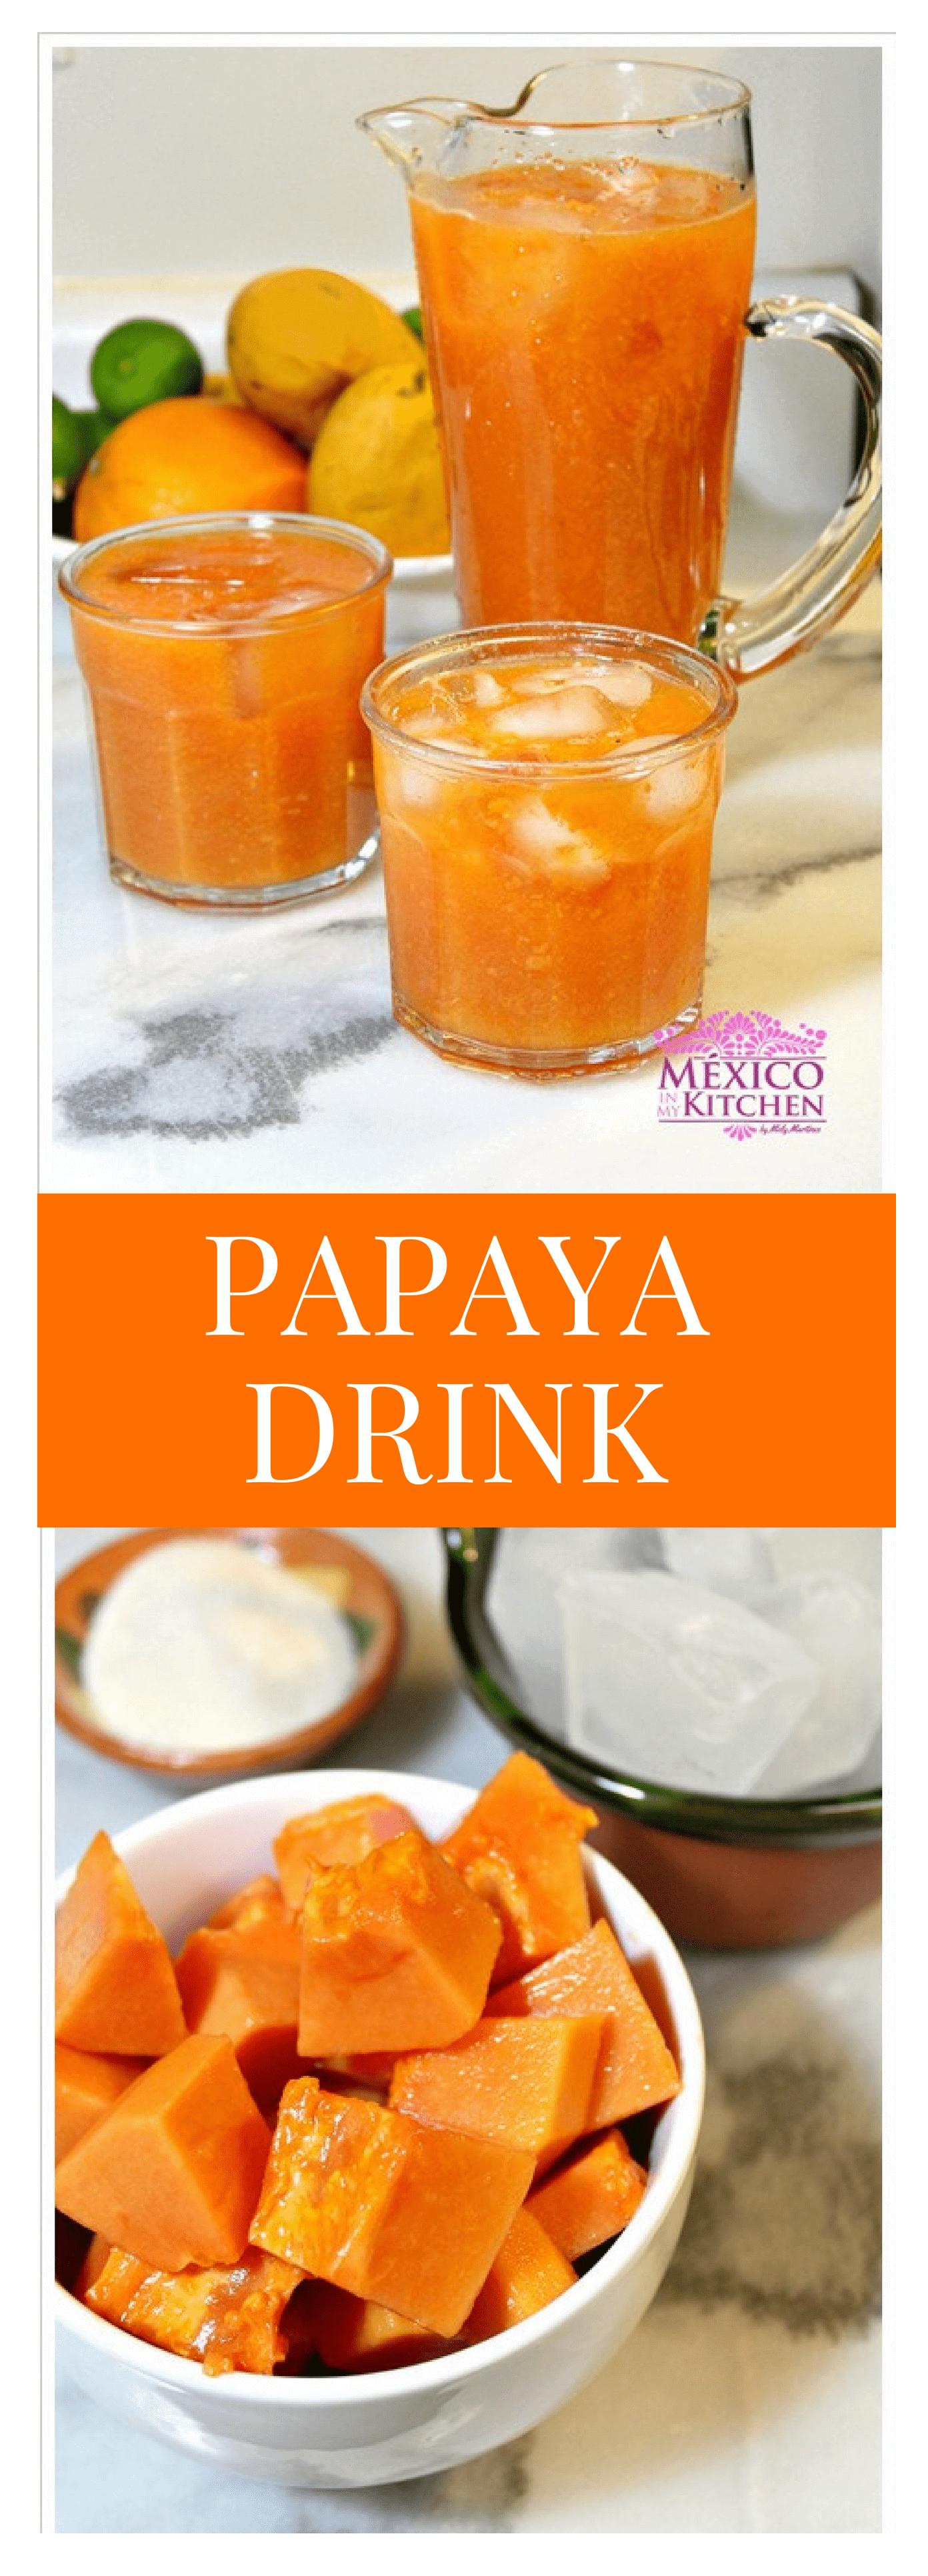 Papaya Drink Recipe Papaya drink, Papaya recipes, Agua